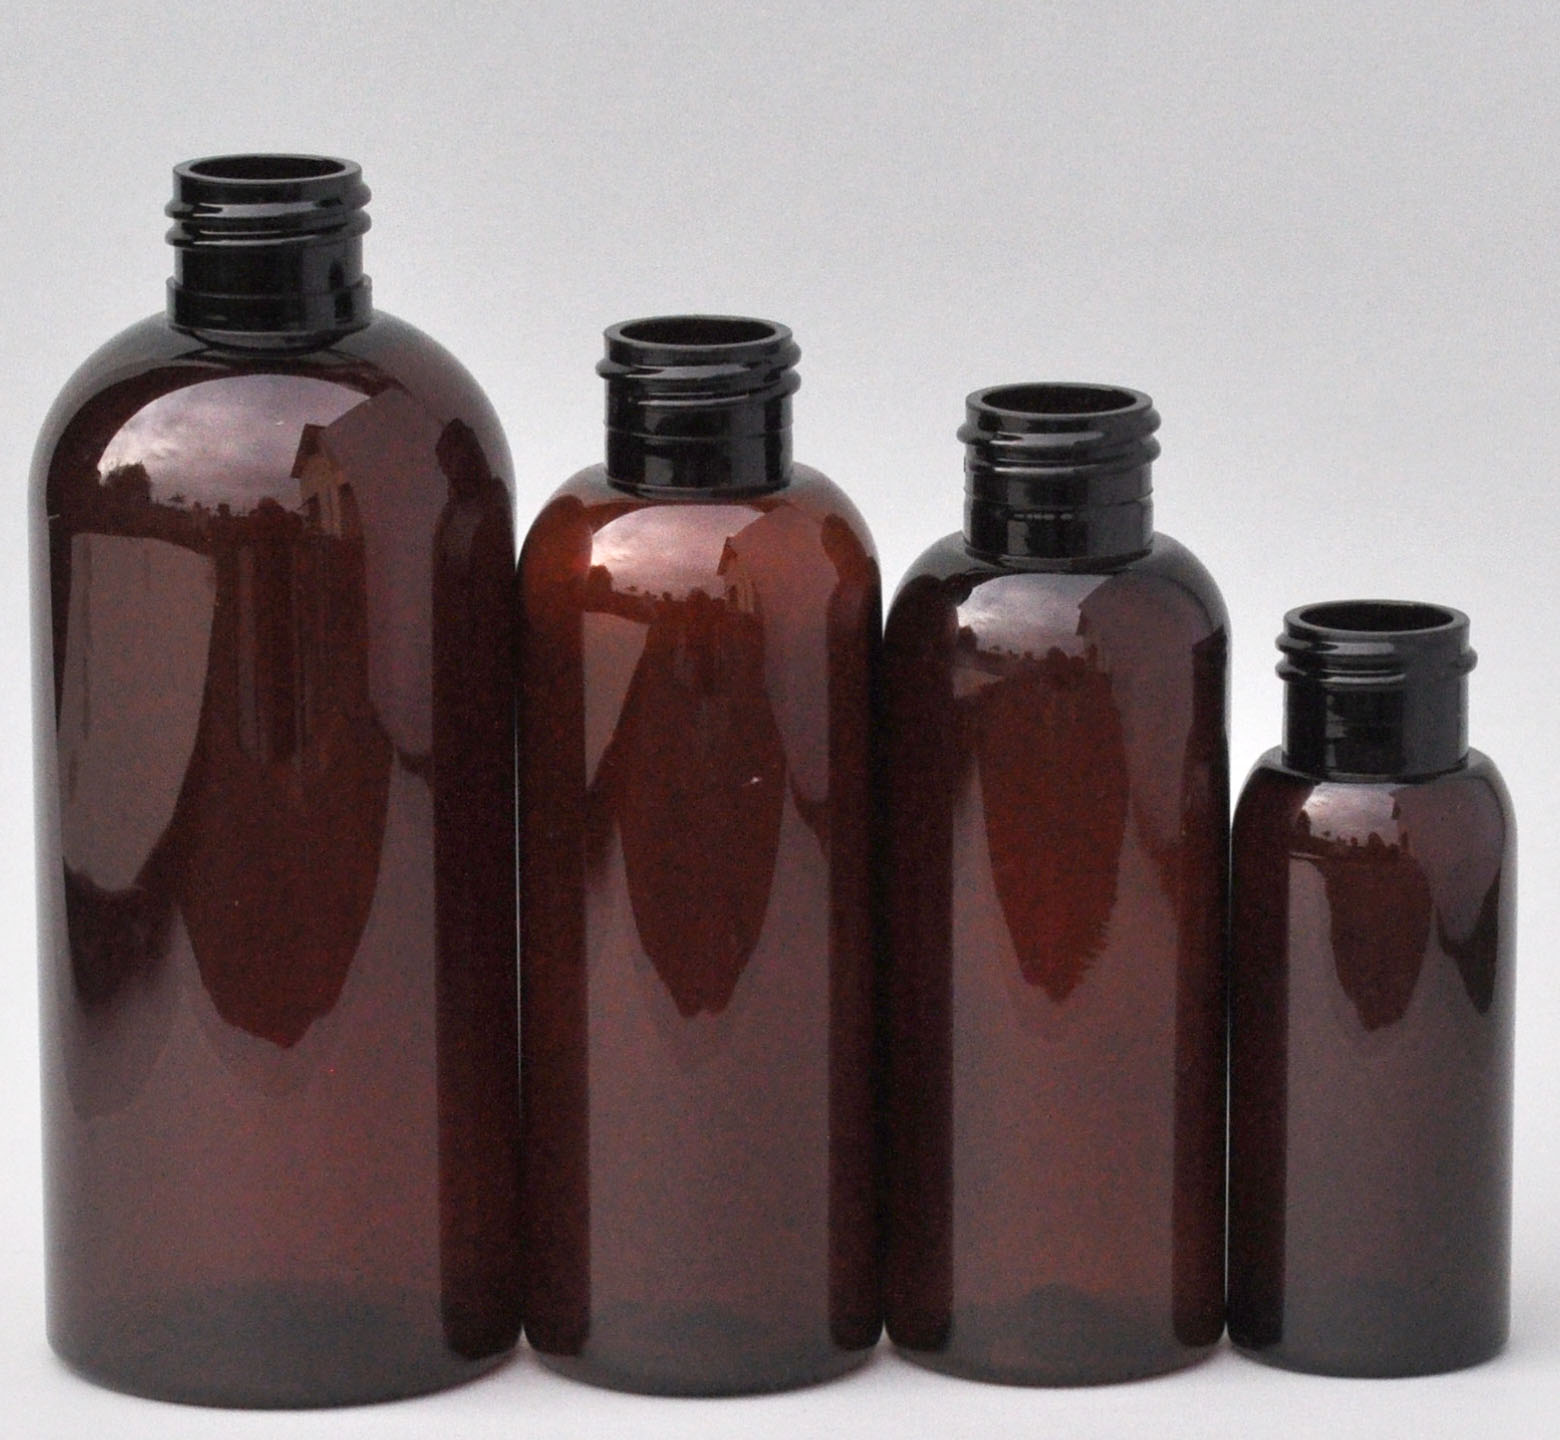 SNEP-50BPETA-50ml Amber PET Boston Bottle with 24/410 Neck